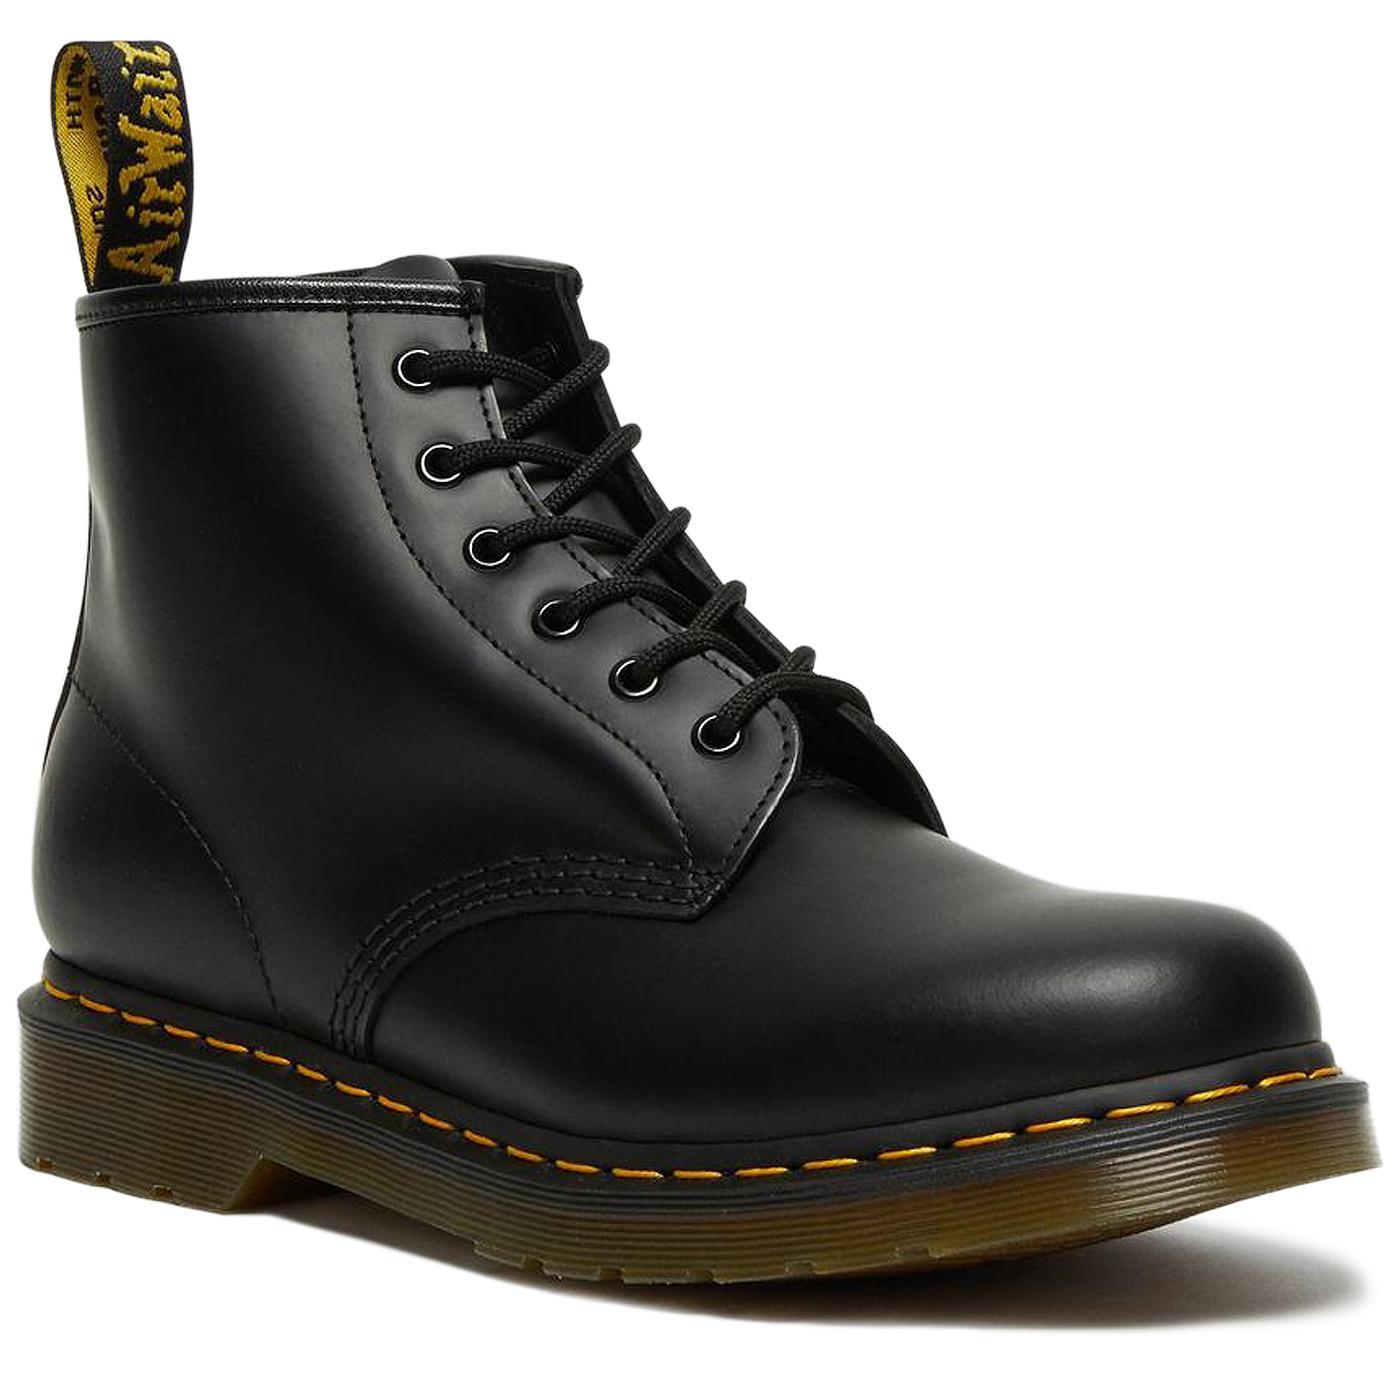 101 YS DR MARTENS Retro Mod 6 Eyelet Boots (B/YS)